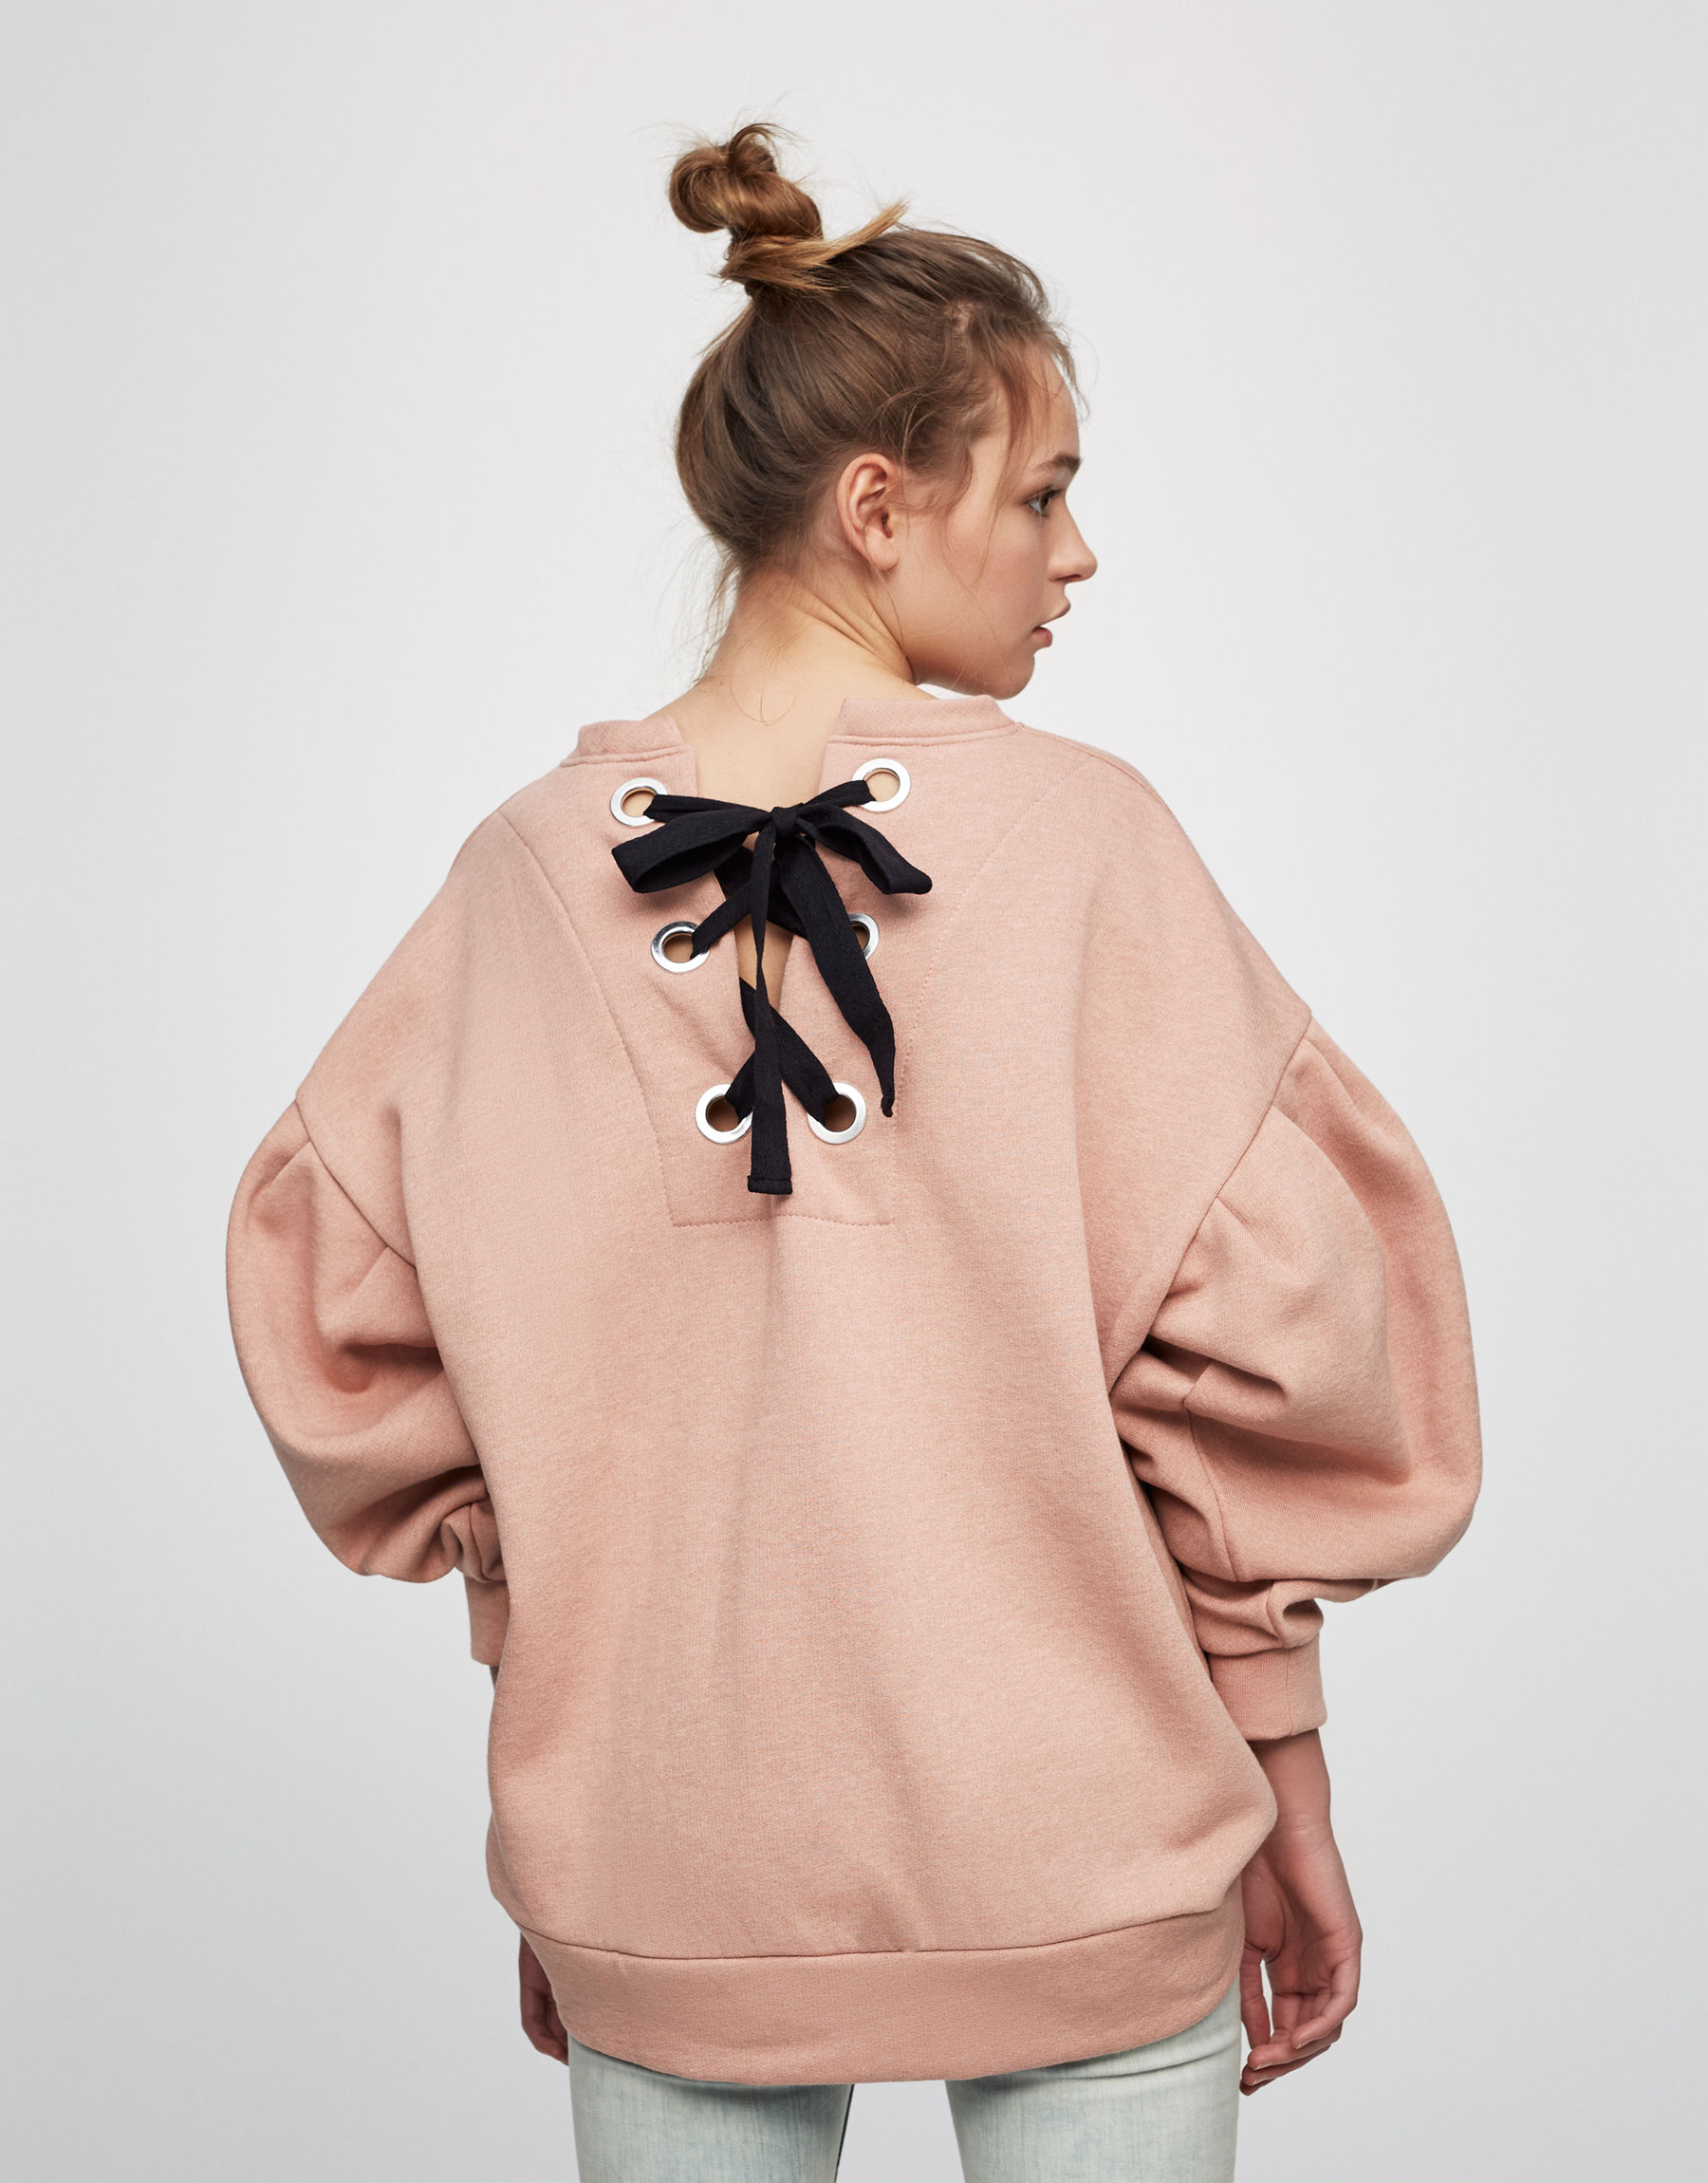 pullbear-sweatshirt-bows.jpg